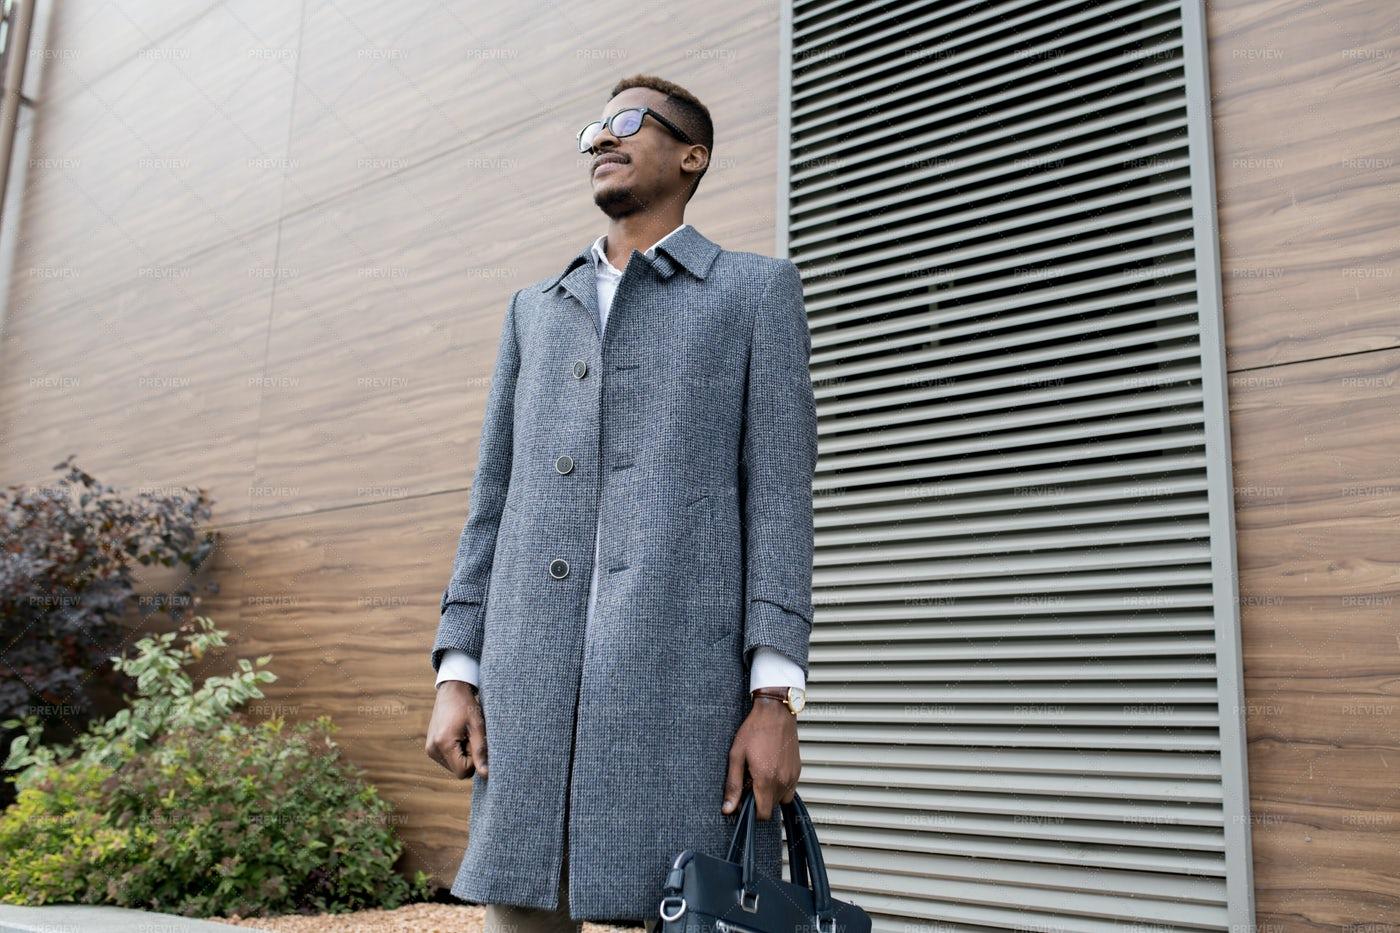 Pensive Stylish African Businessman...: Stock Photos